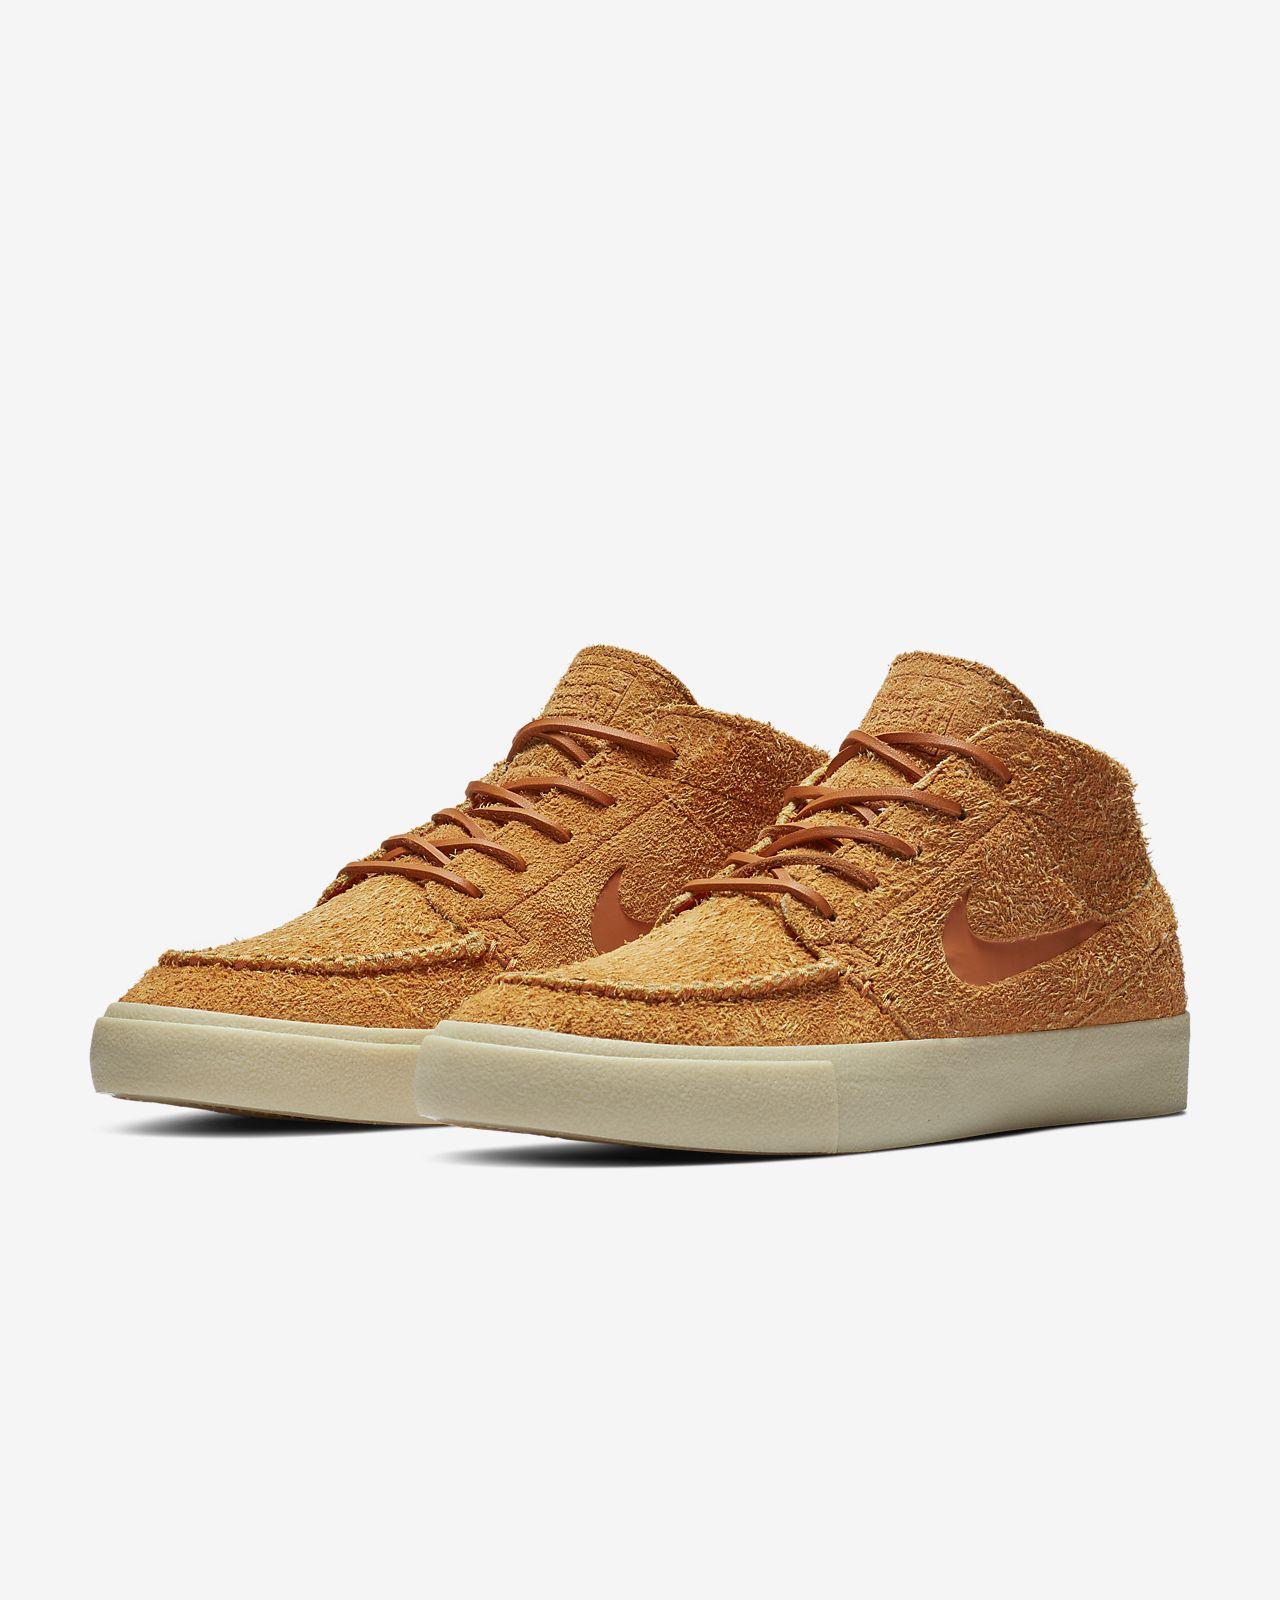 Chaussures Skate Nike SB Zoom Stefan Janoski RM Rose Gold